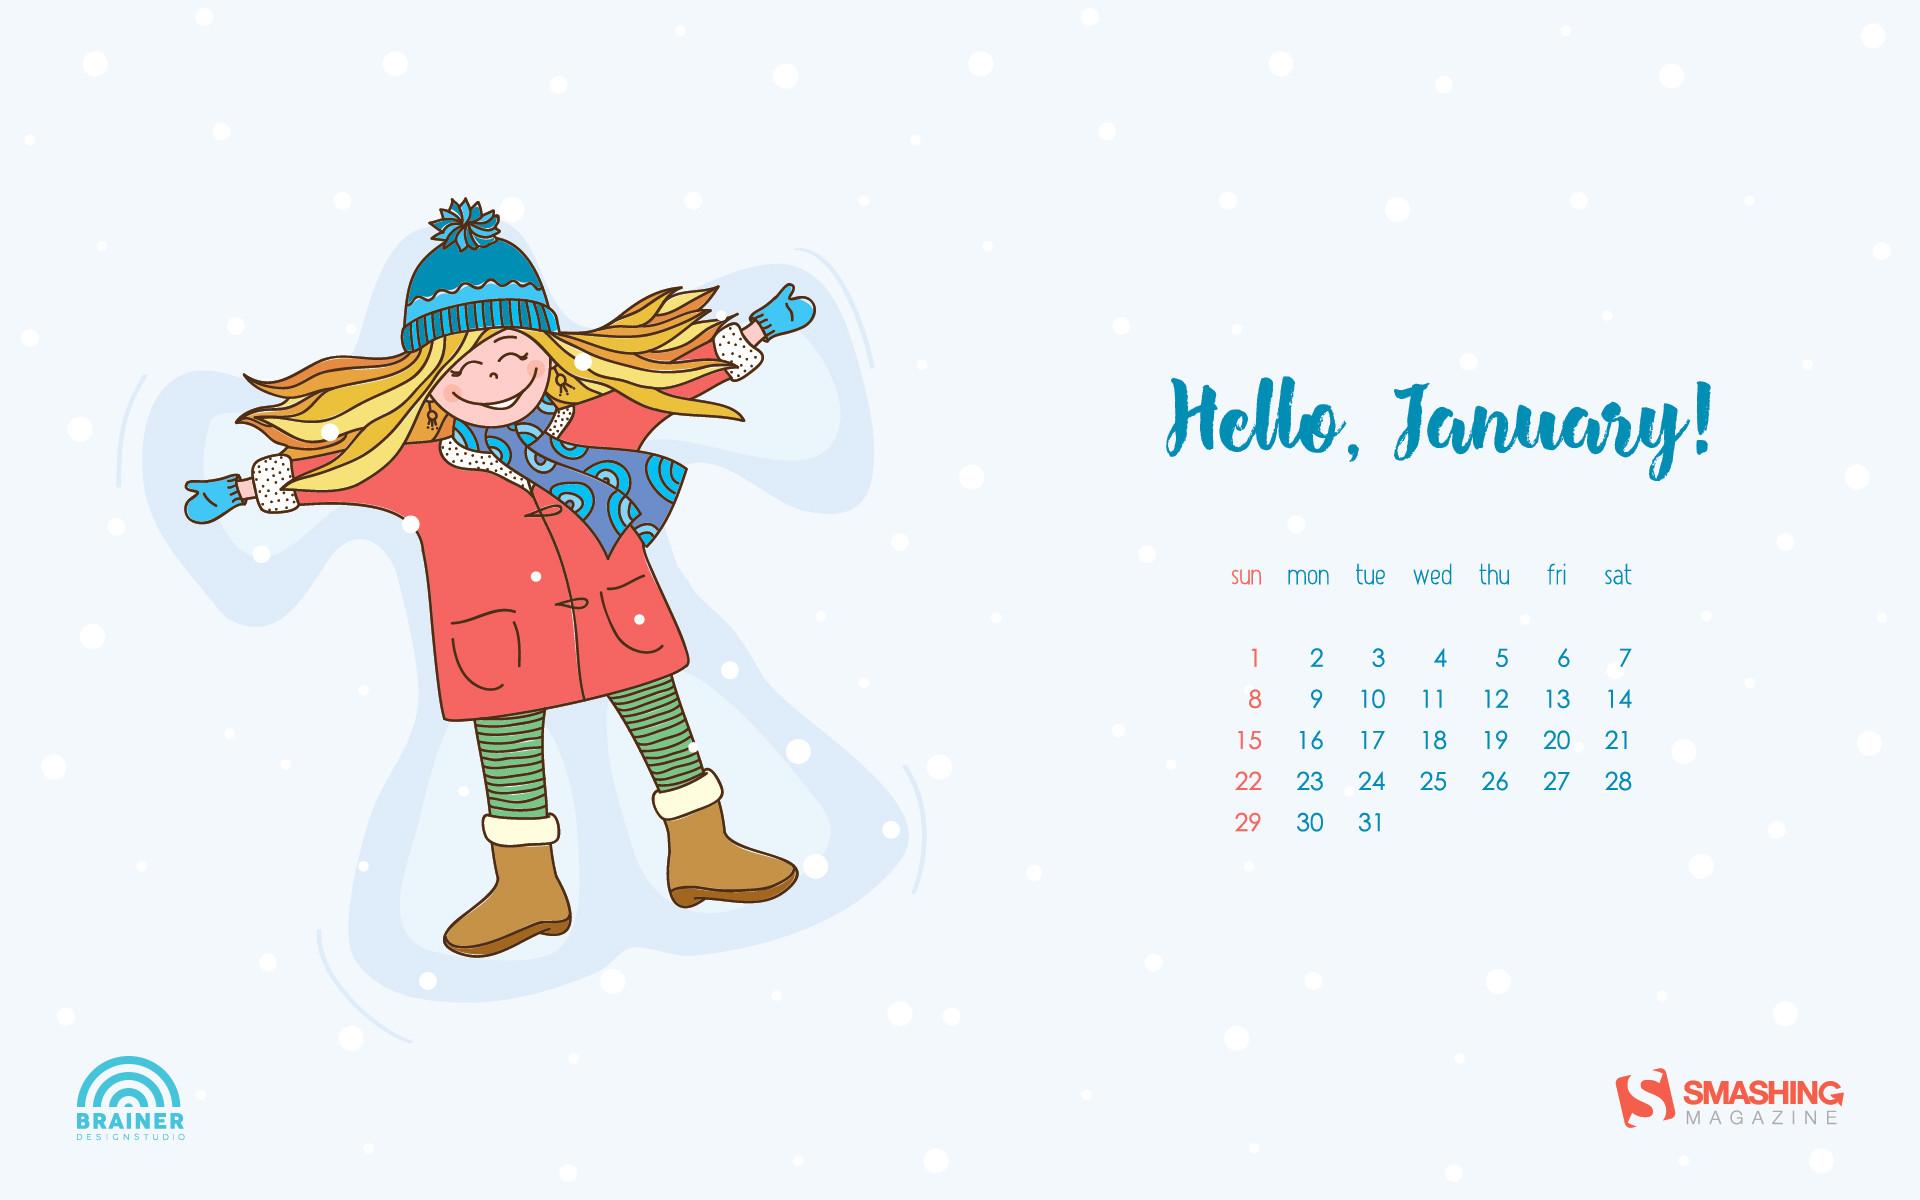 January 2018 Desktop Wallpaper (61+ images)